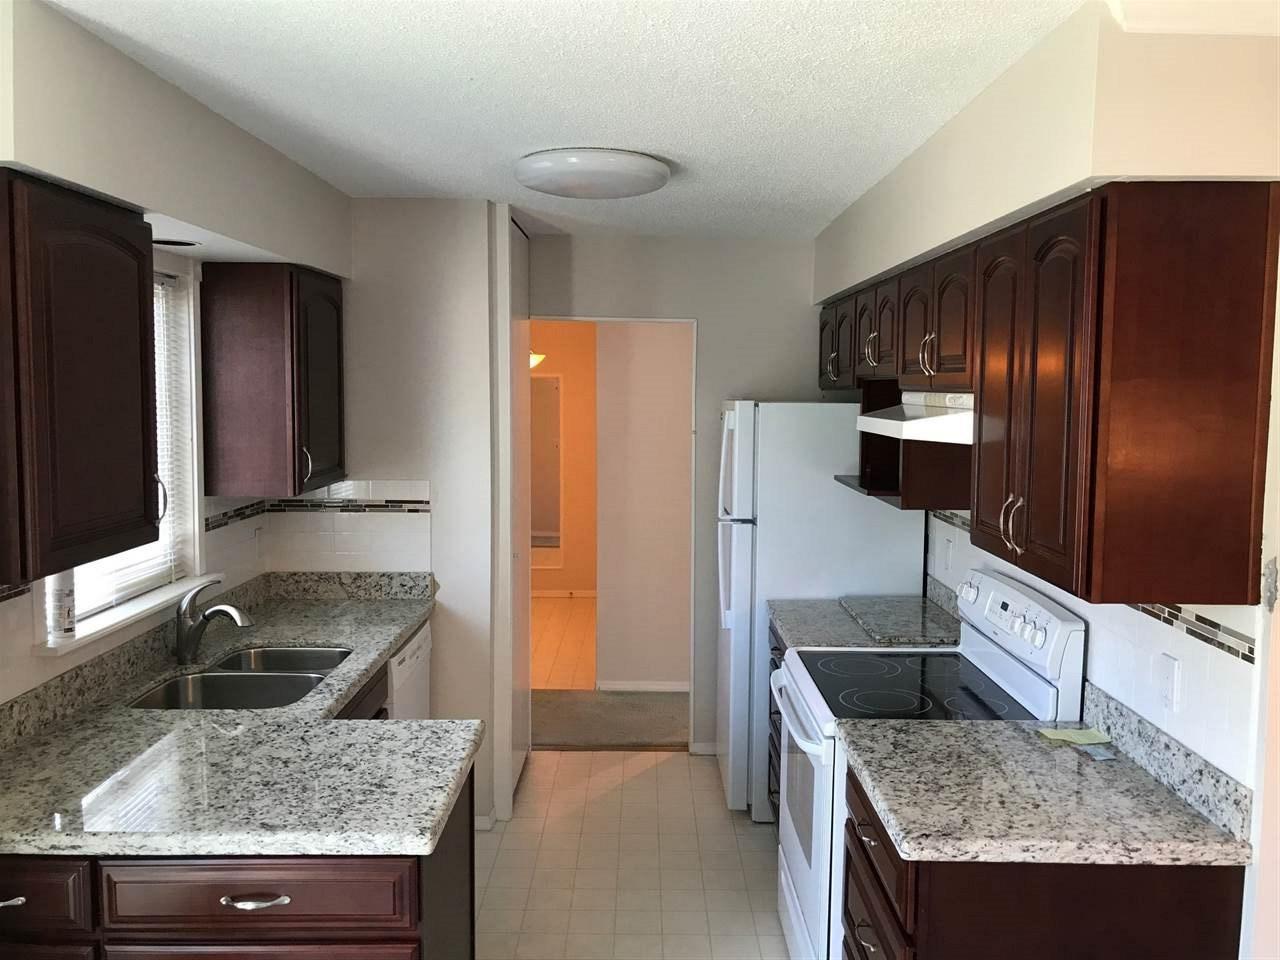 Condo Apartment at 303 1351 MARTIN STREET, Unit 303, South Surrey White Rock, British Columbia. Image 9